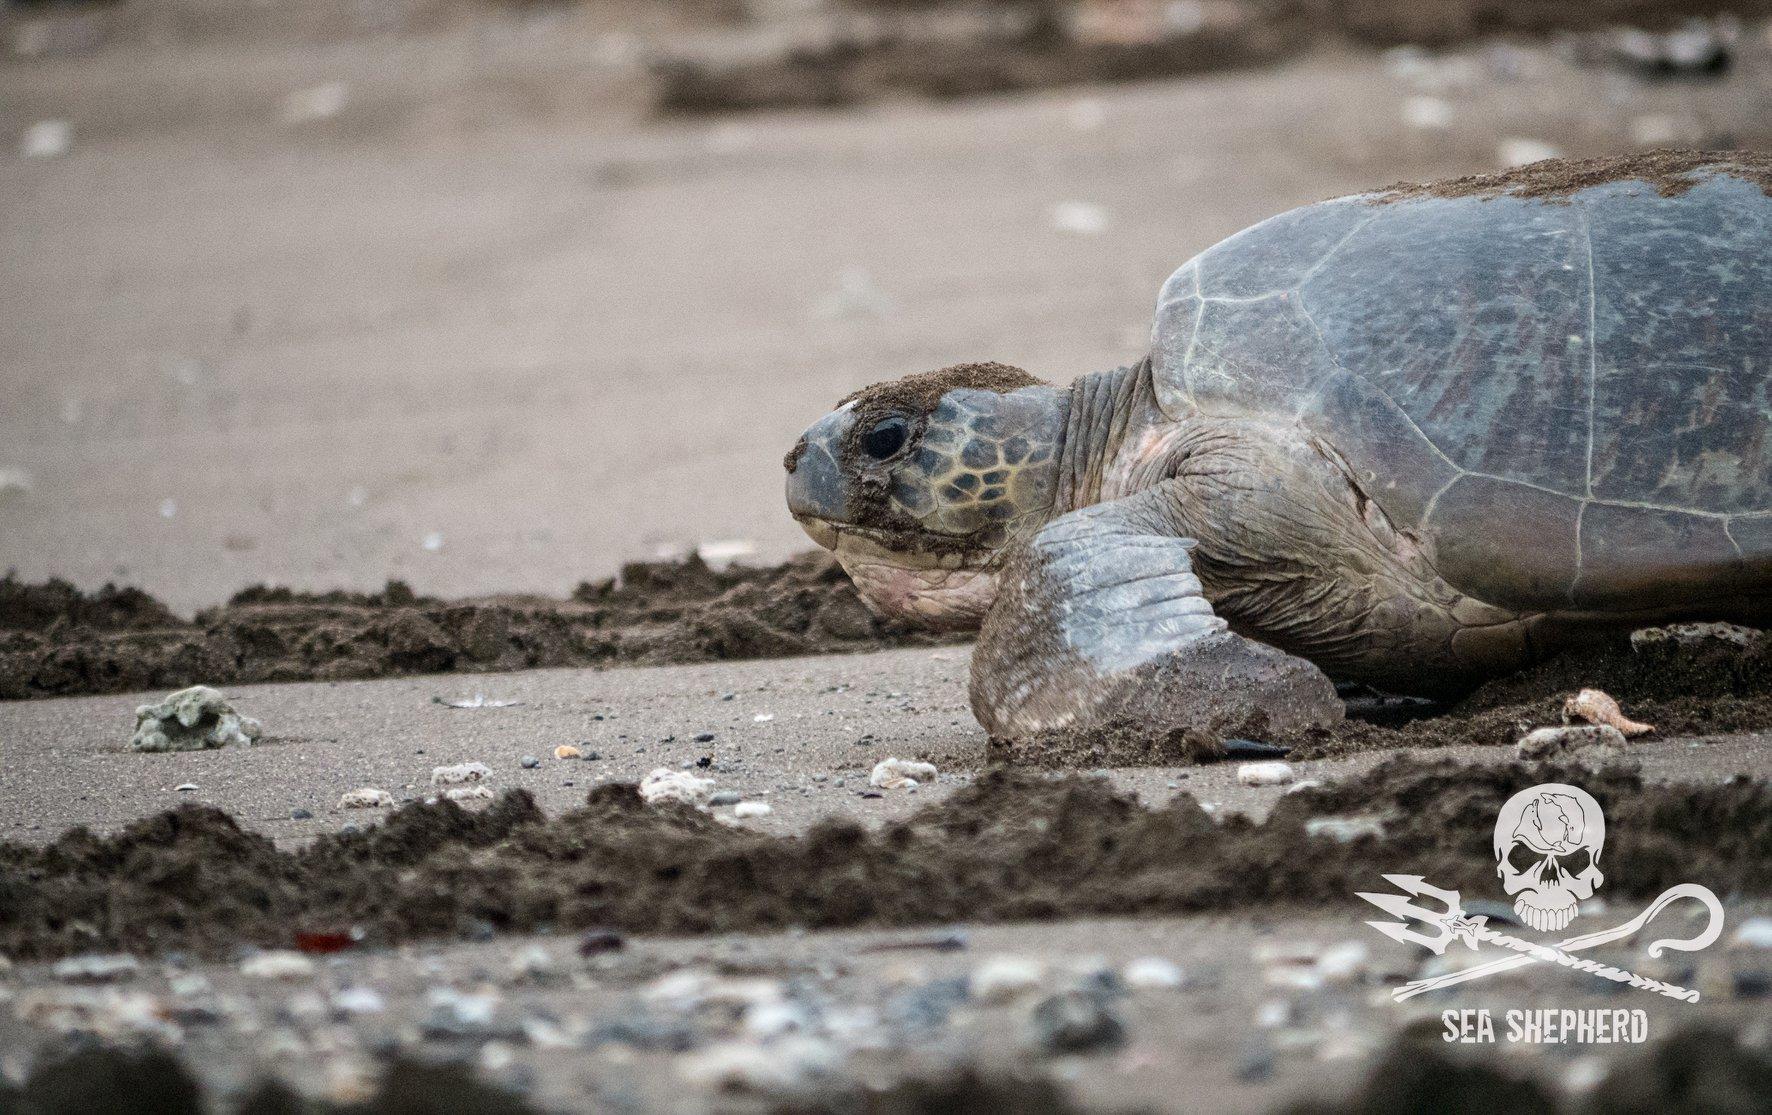 Une tortue vue de profil